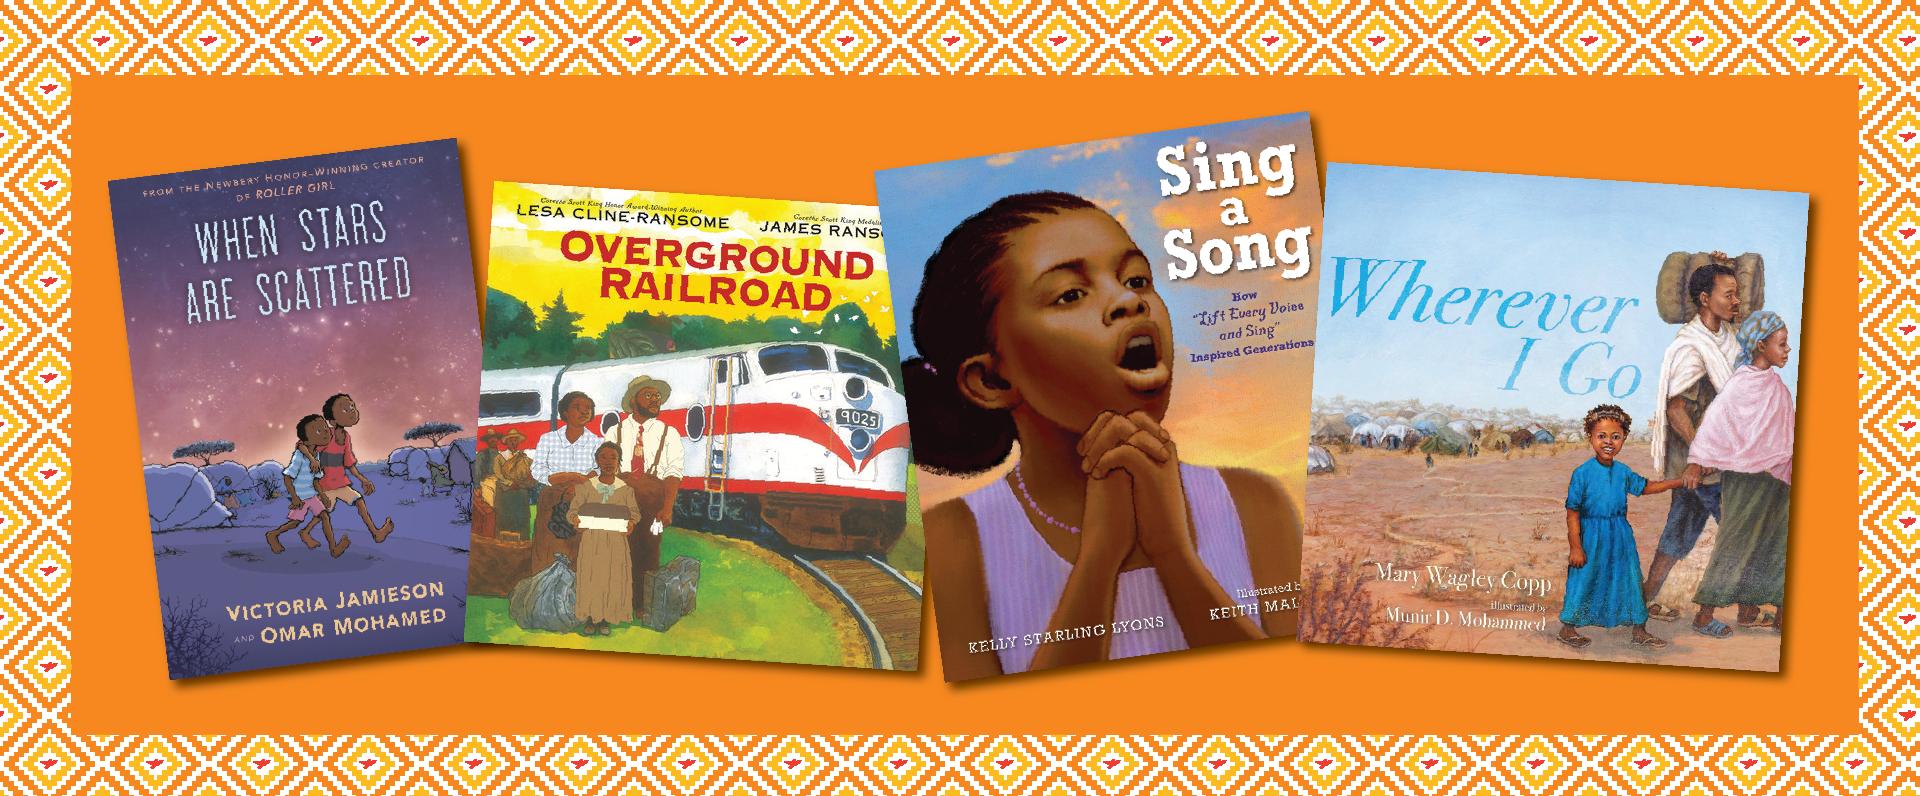 Donate to Beautiful Blackbird Children's Book Festival